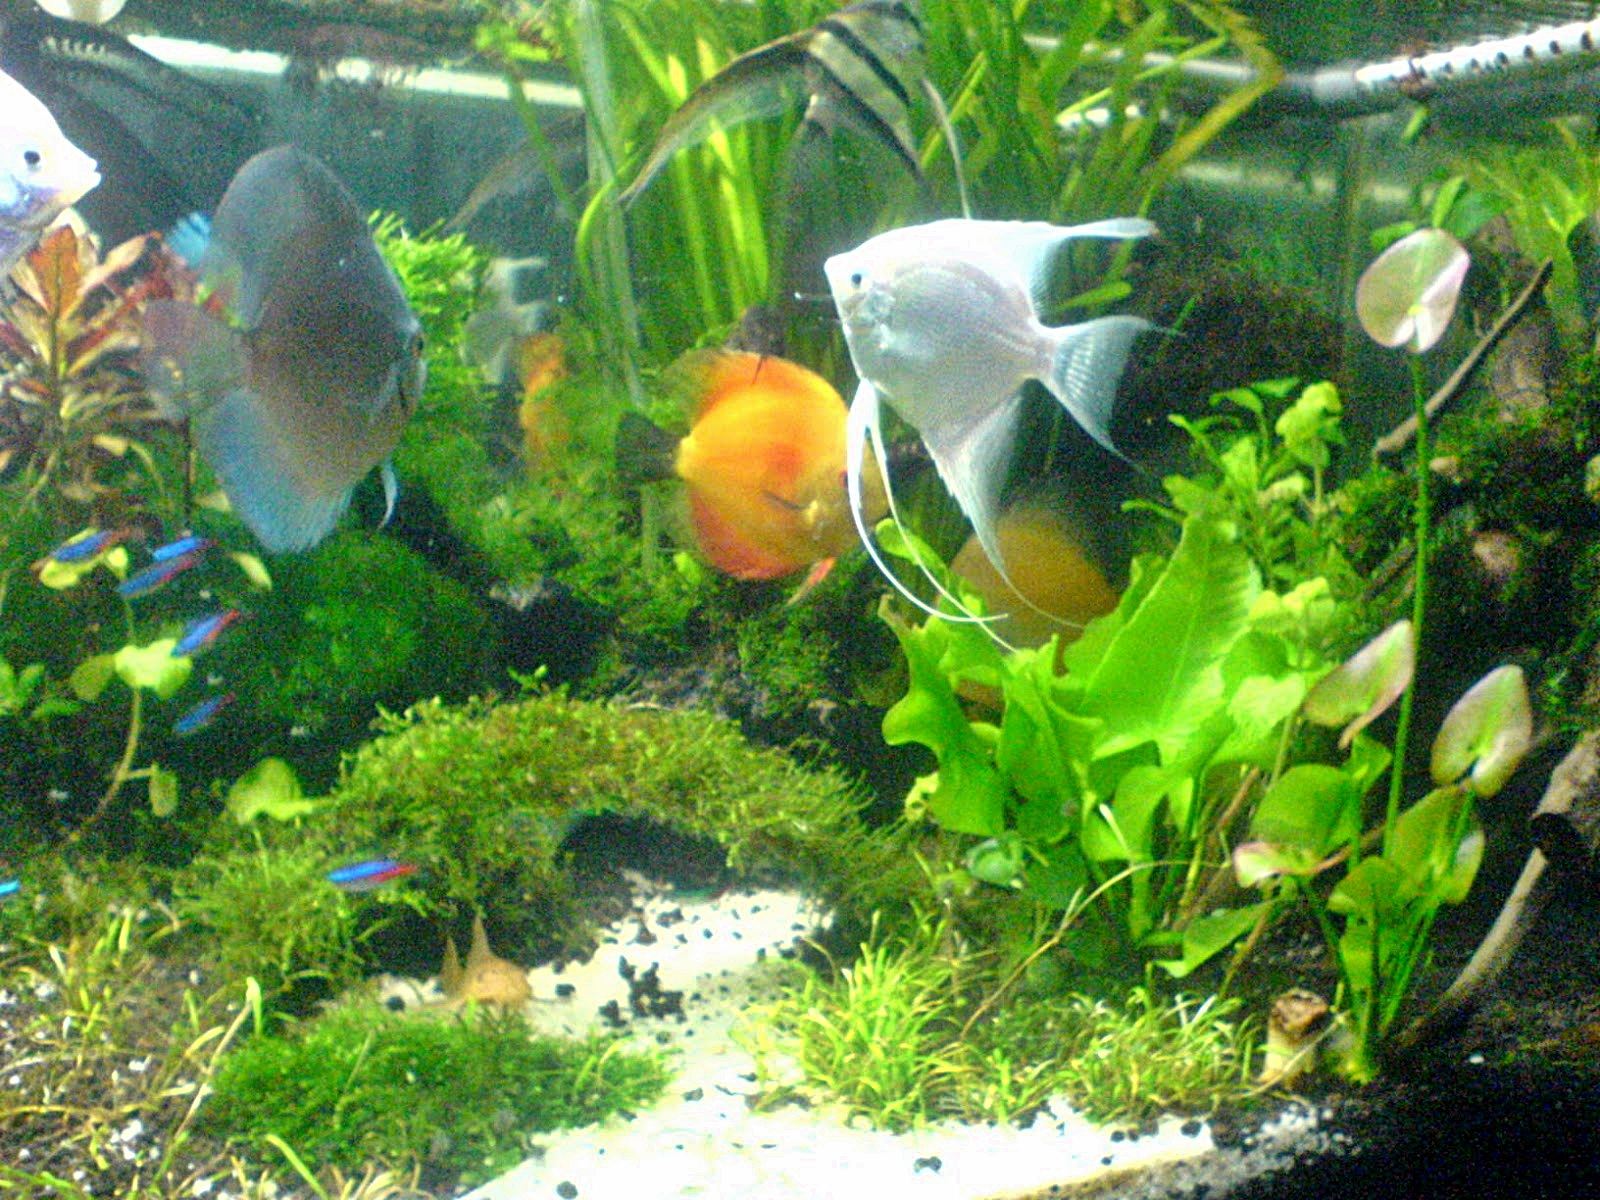 Jenis ikan ikan hias air tawar untuk aquarium menarik share the knownledge - Gambar aquascape ...